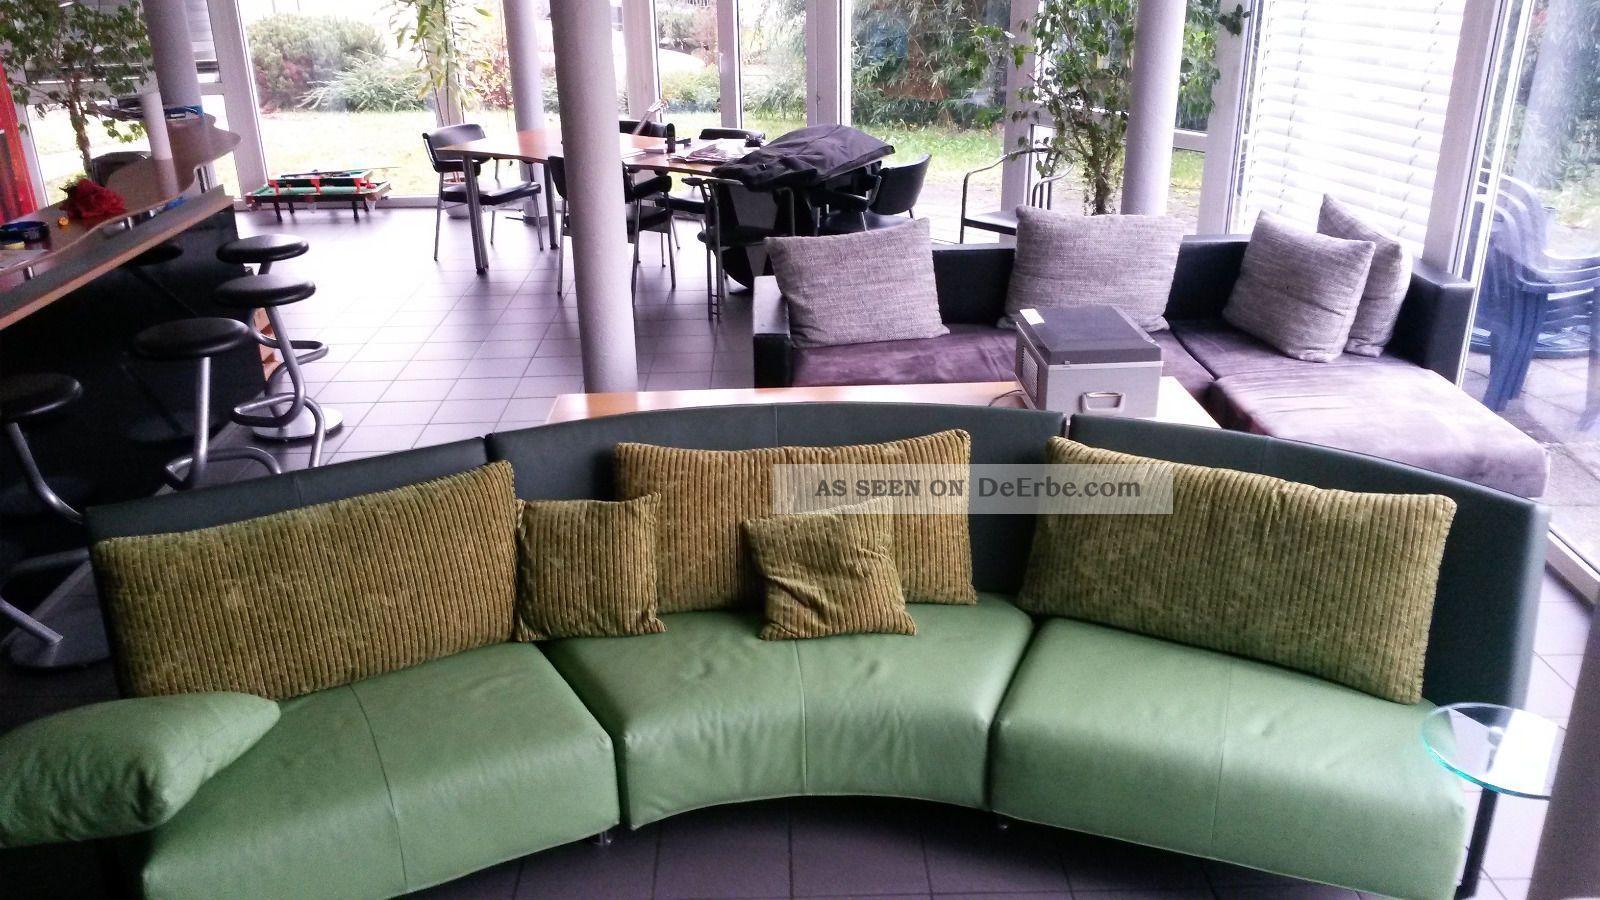 sofa halbrund leder - Google-Suche